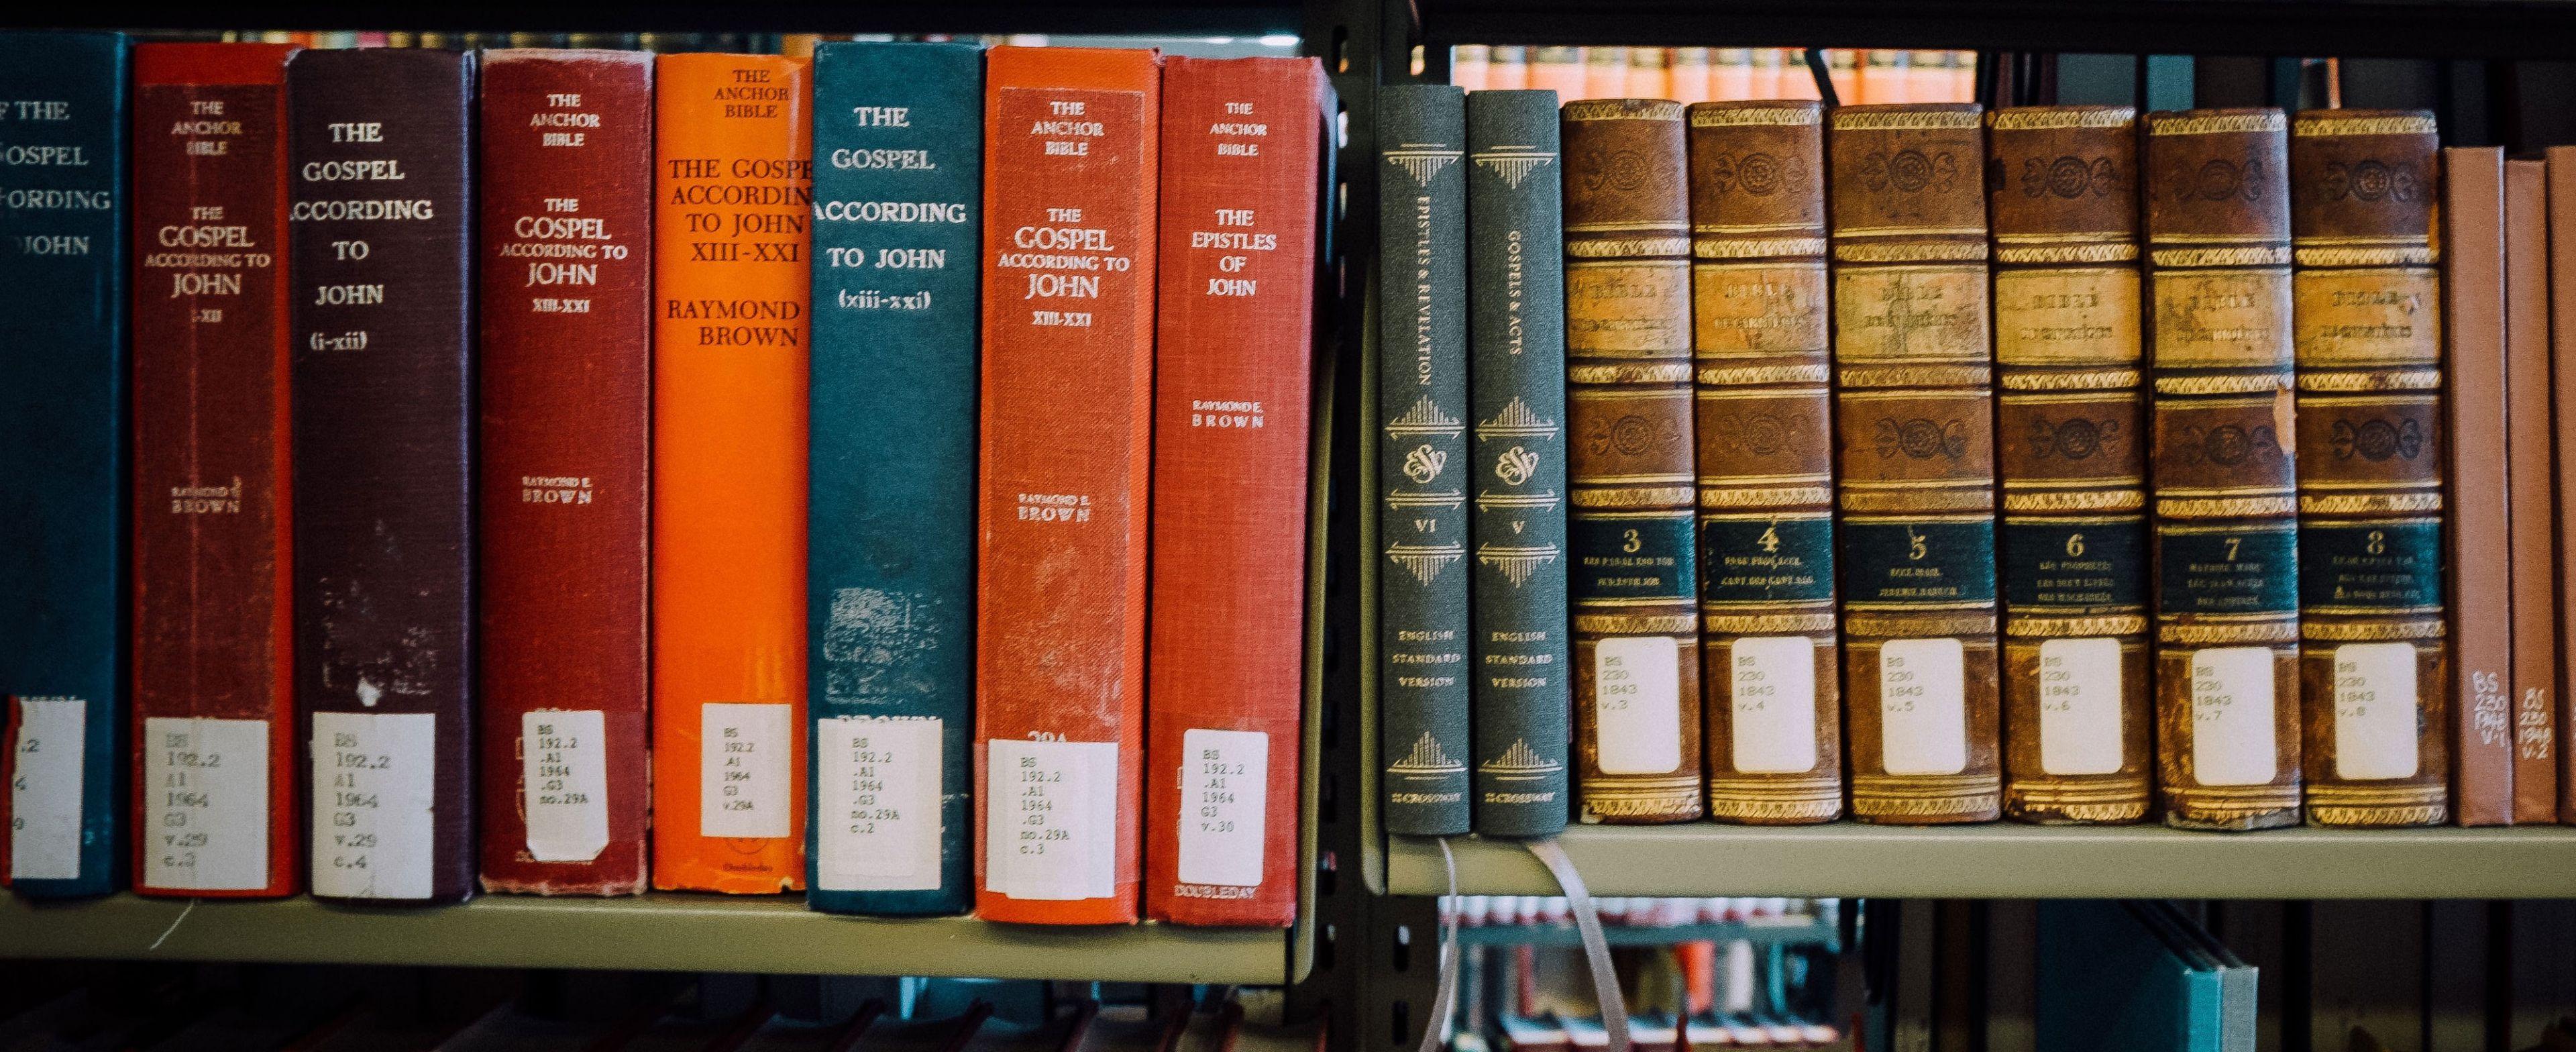 Bachelors Degree In Religious Studies New Testament